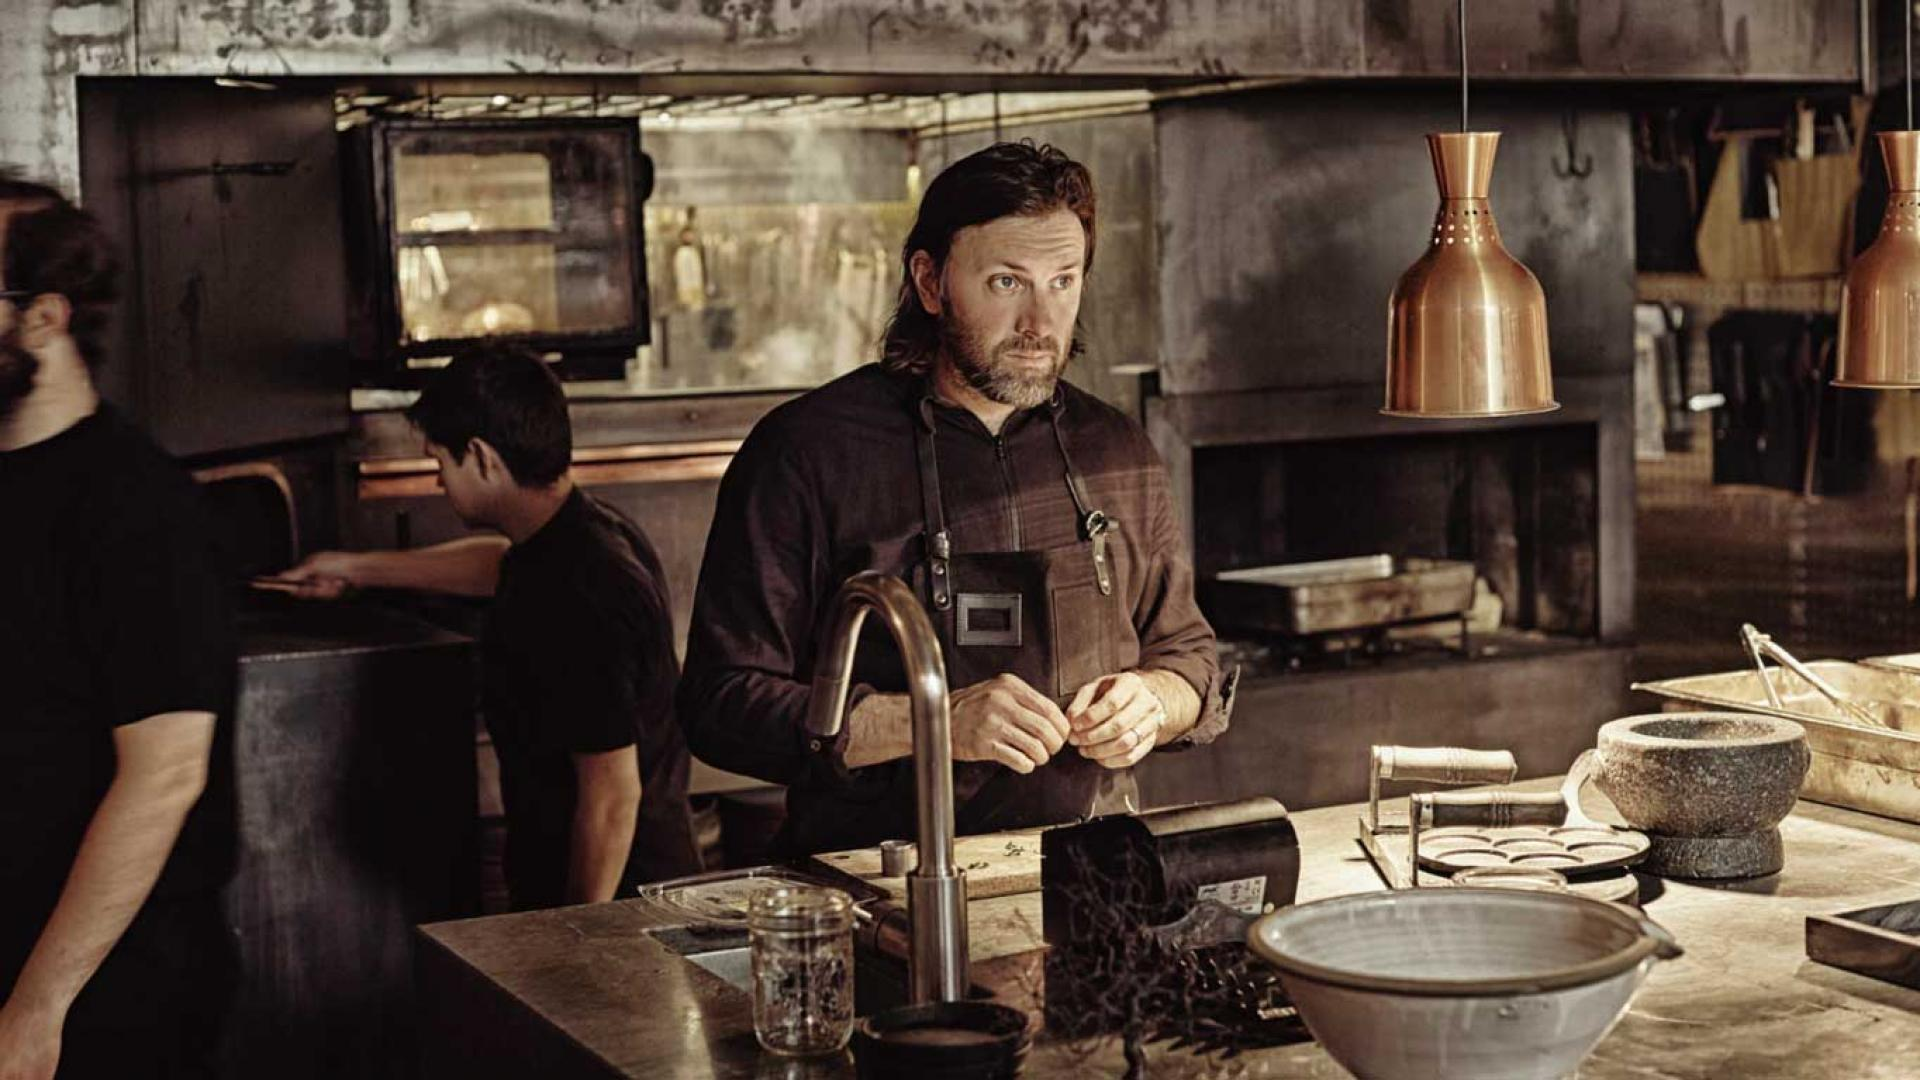 New London restaurants: Ekstedt at The Yard